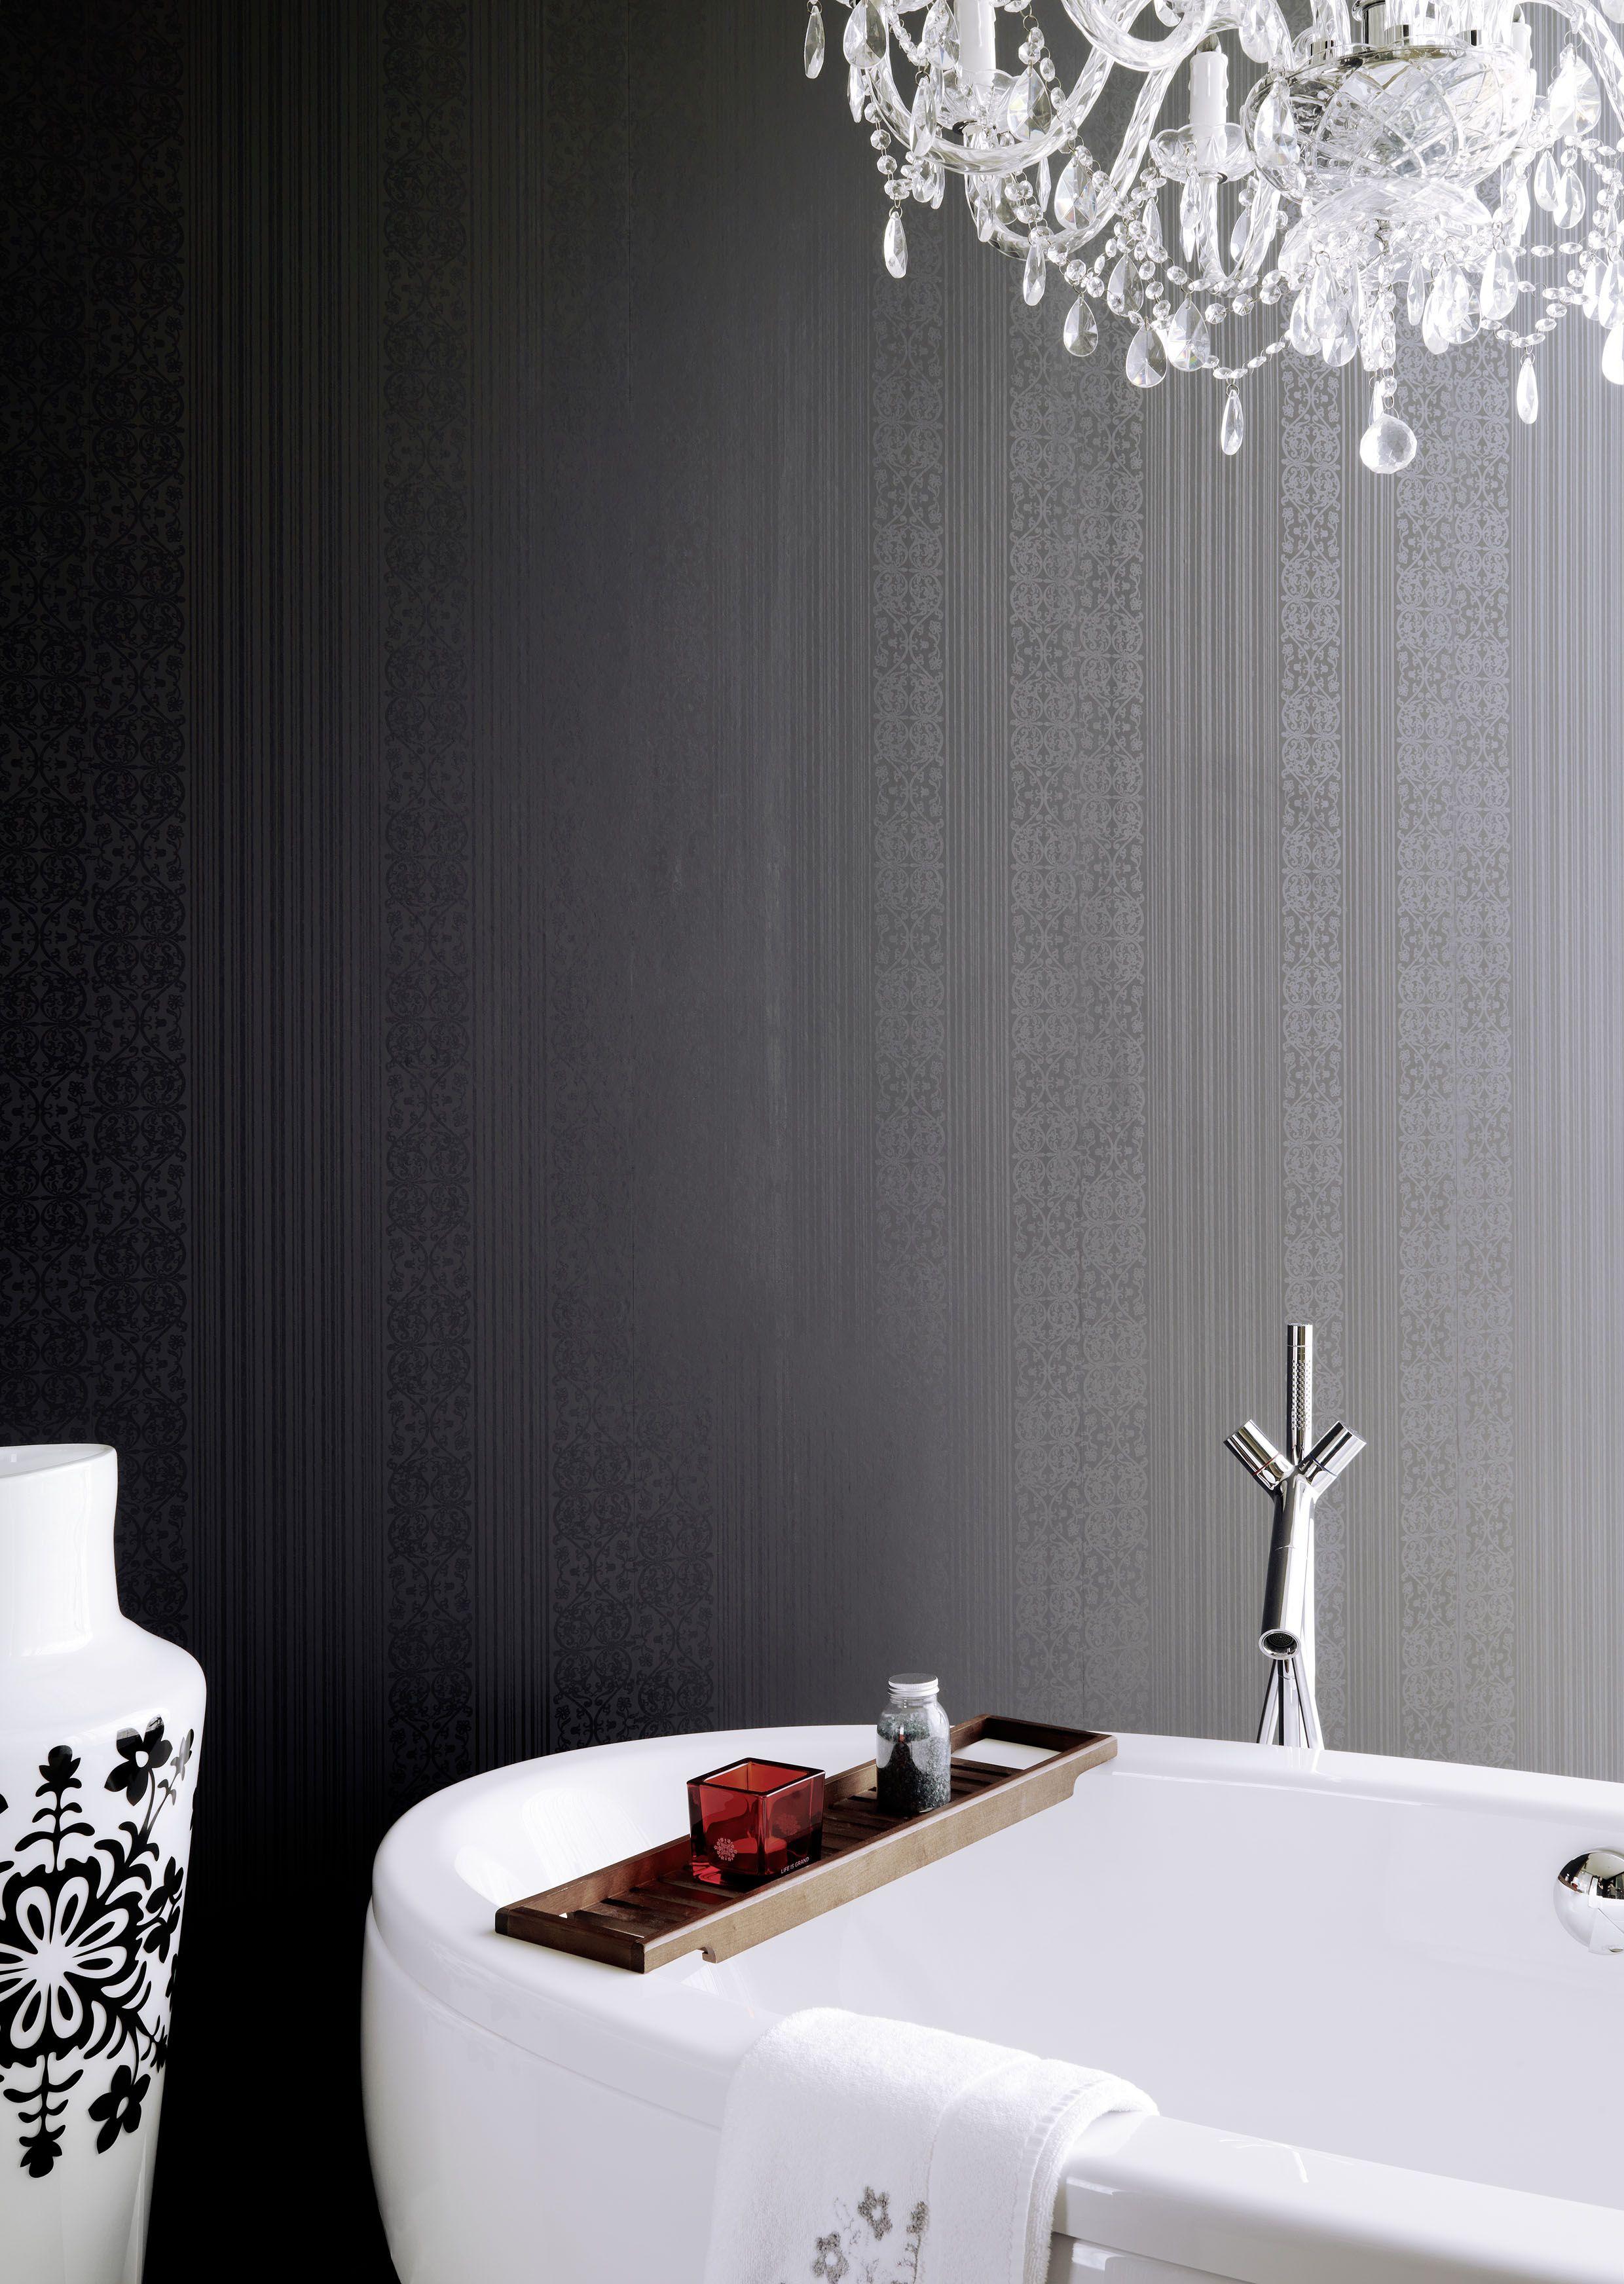 badezimmer bonn neu bild und aadbdbdbbdfe